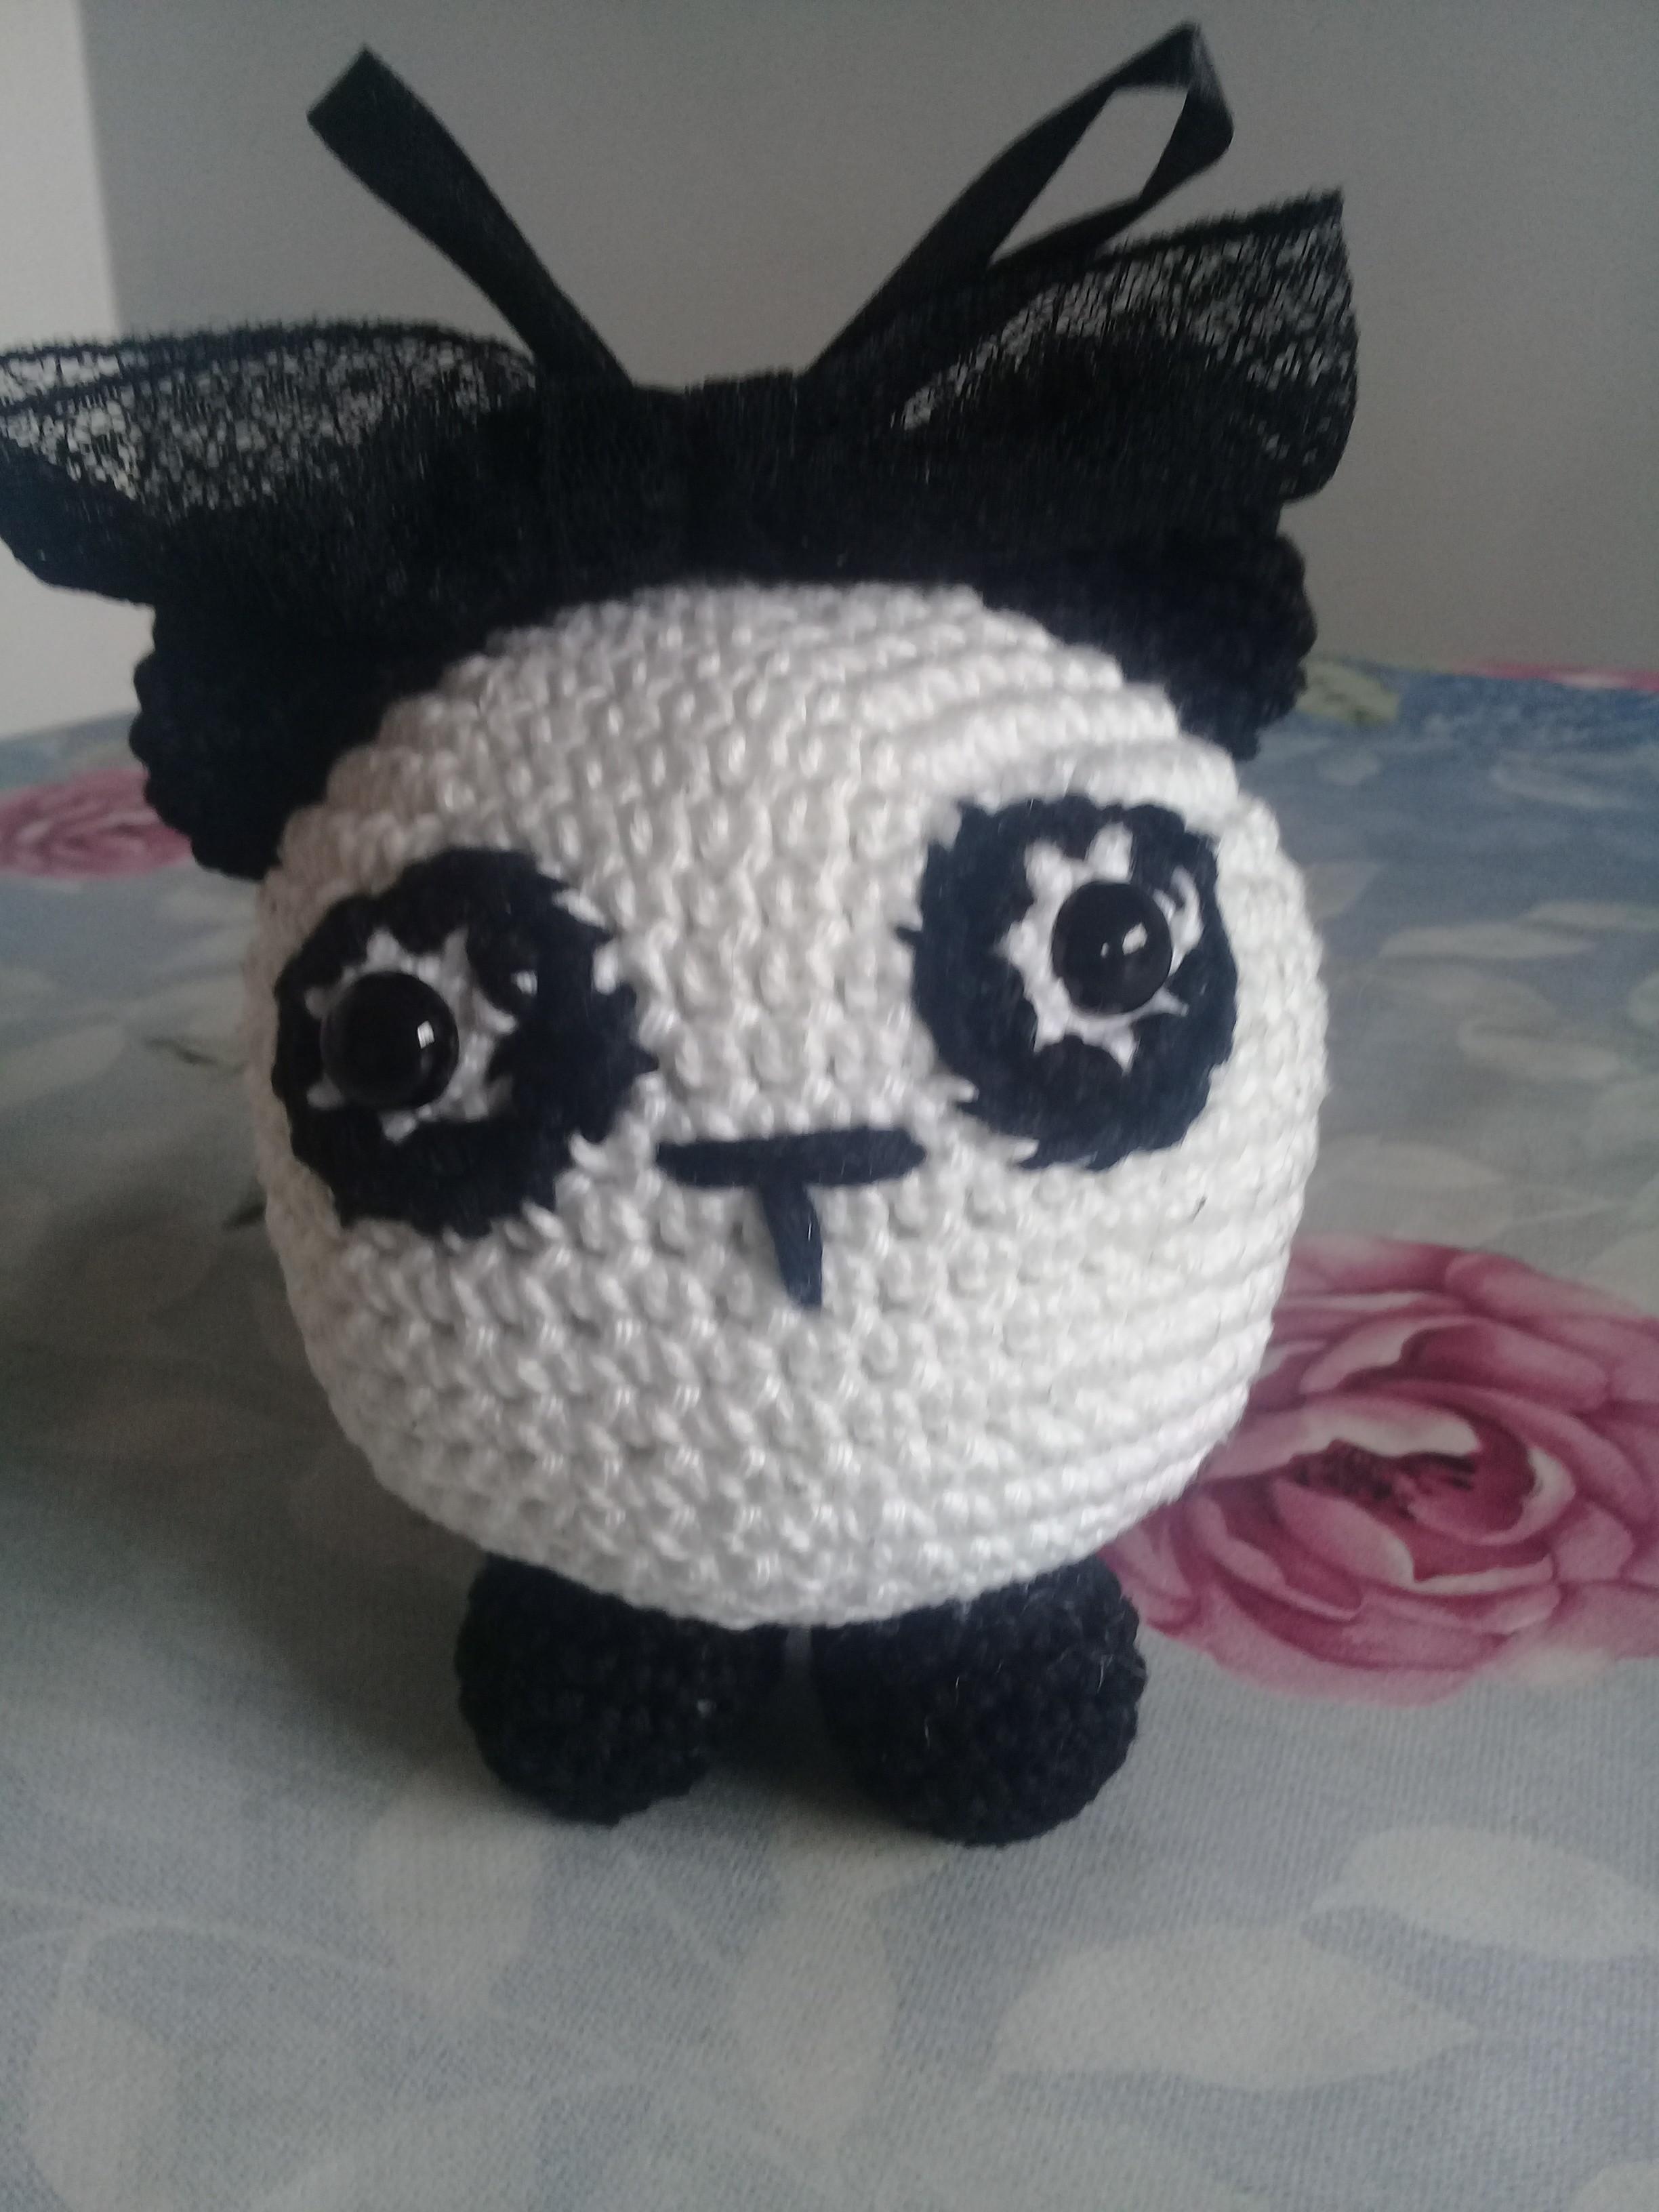 Amigurumi urso panda | Urso panda, Panda, Urso | 3264x2448